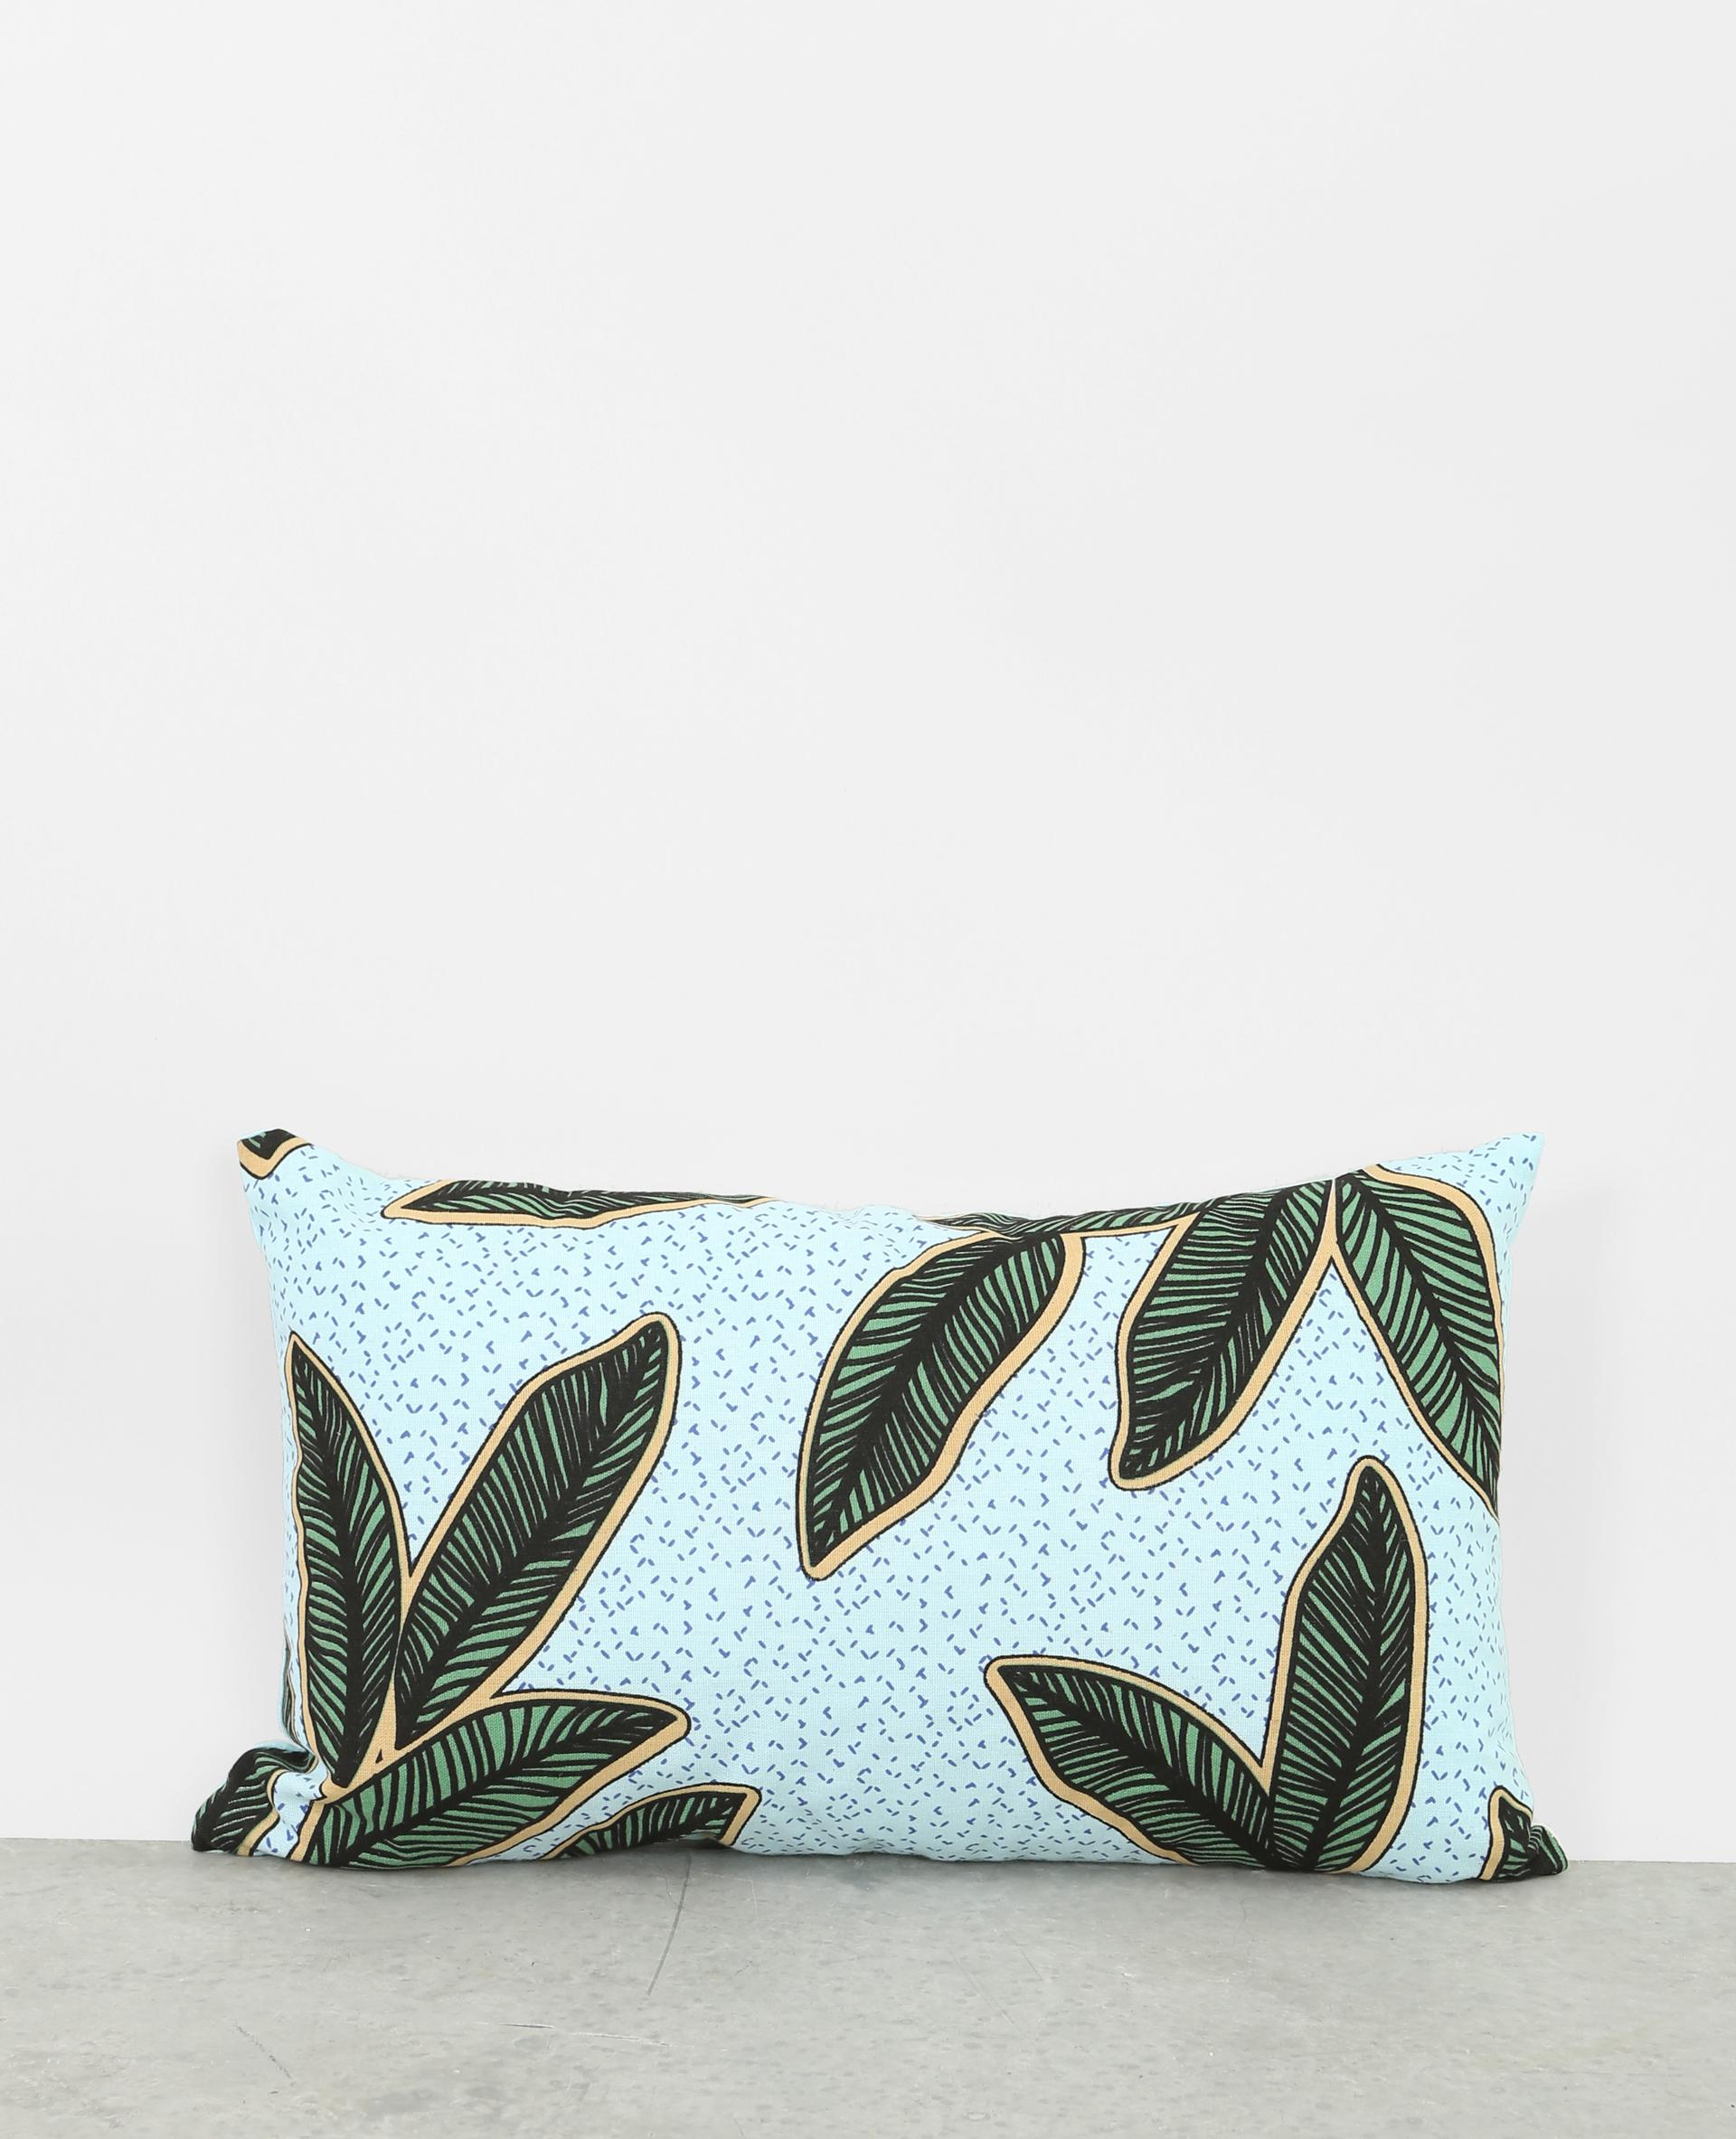 coussin imprim feuilles bleu ciel 907297a60i05 pimkie. Black Bedroom Furniture Sets. Home Design Ideas